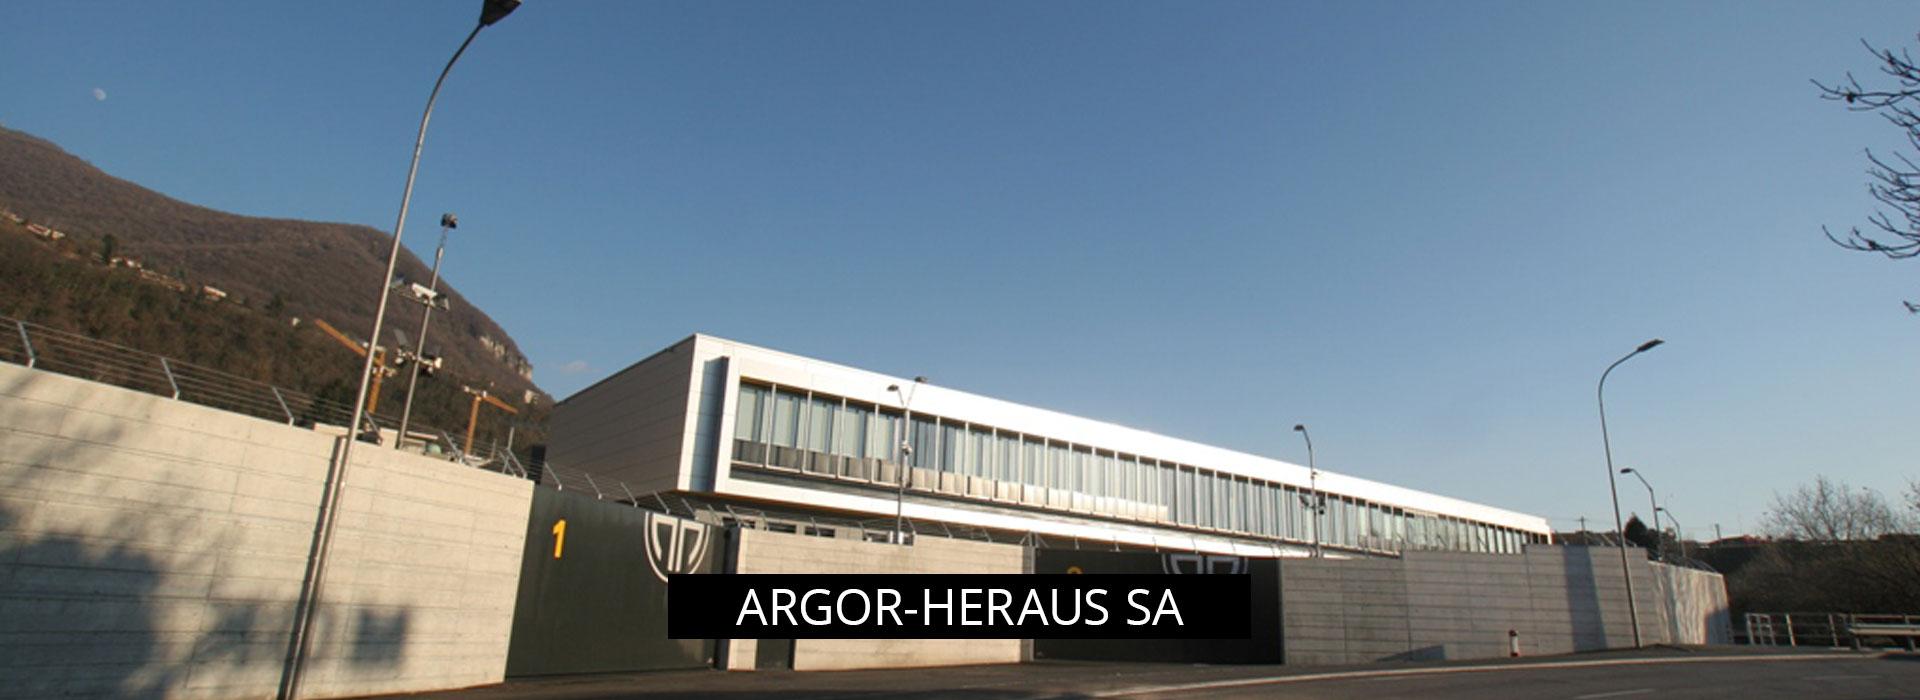 Argor_heraeus